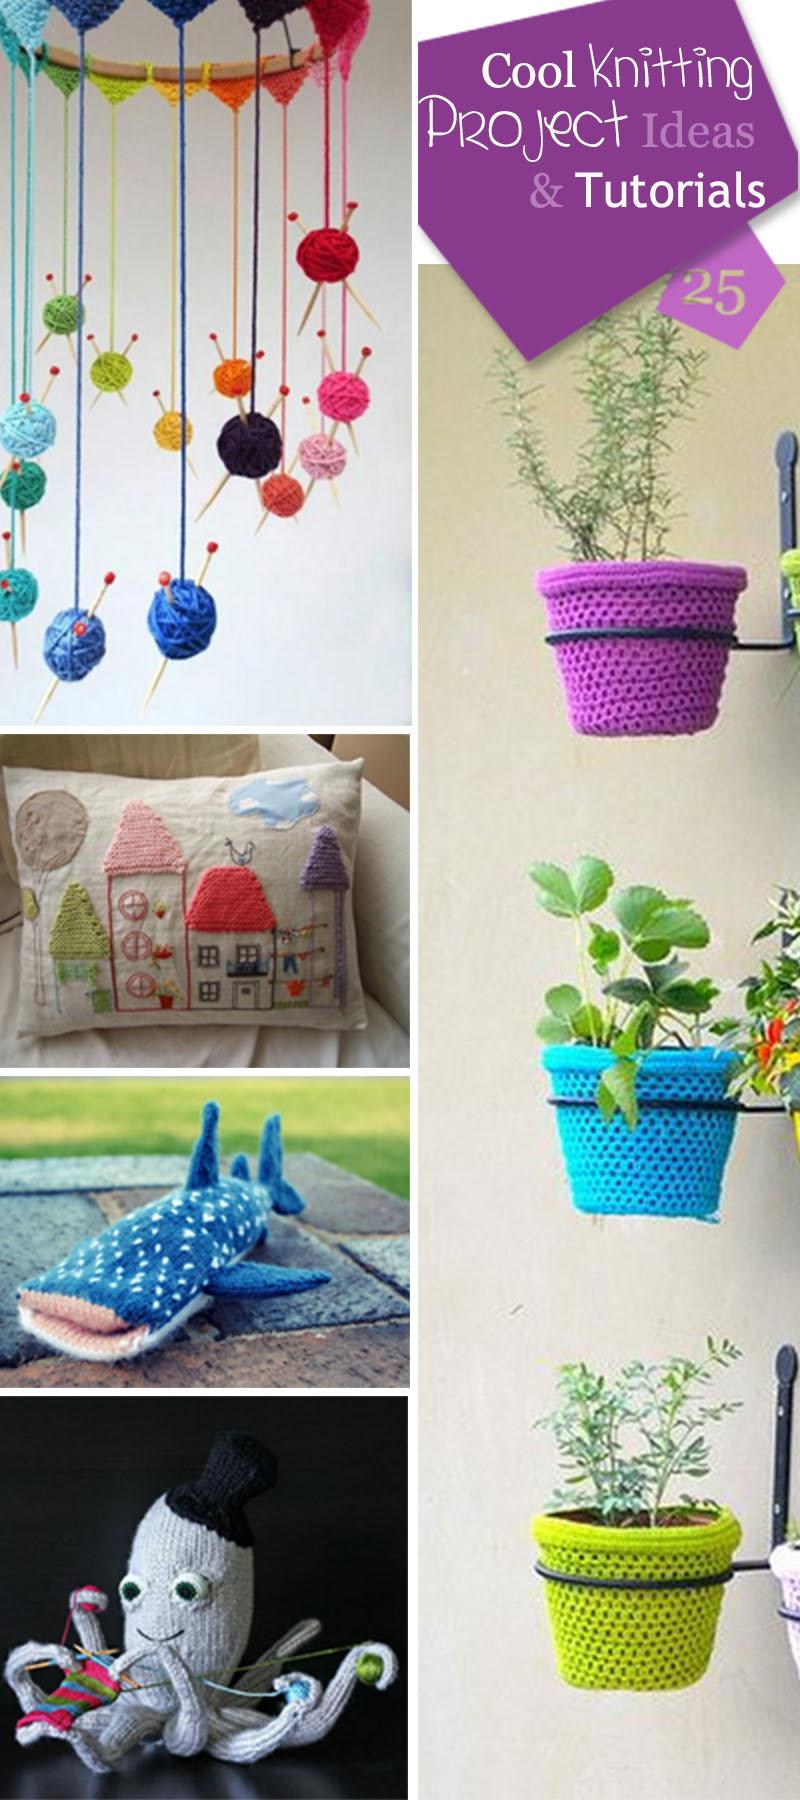 Cool Knitting Project Ideas & Tutorials!